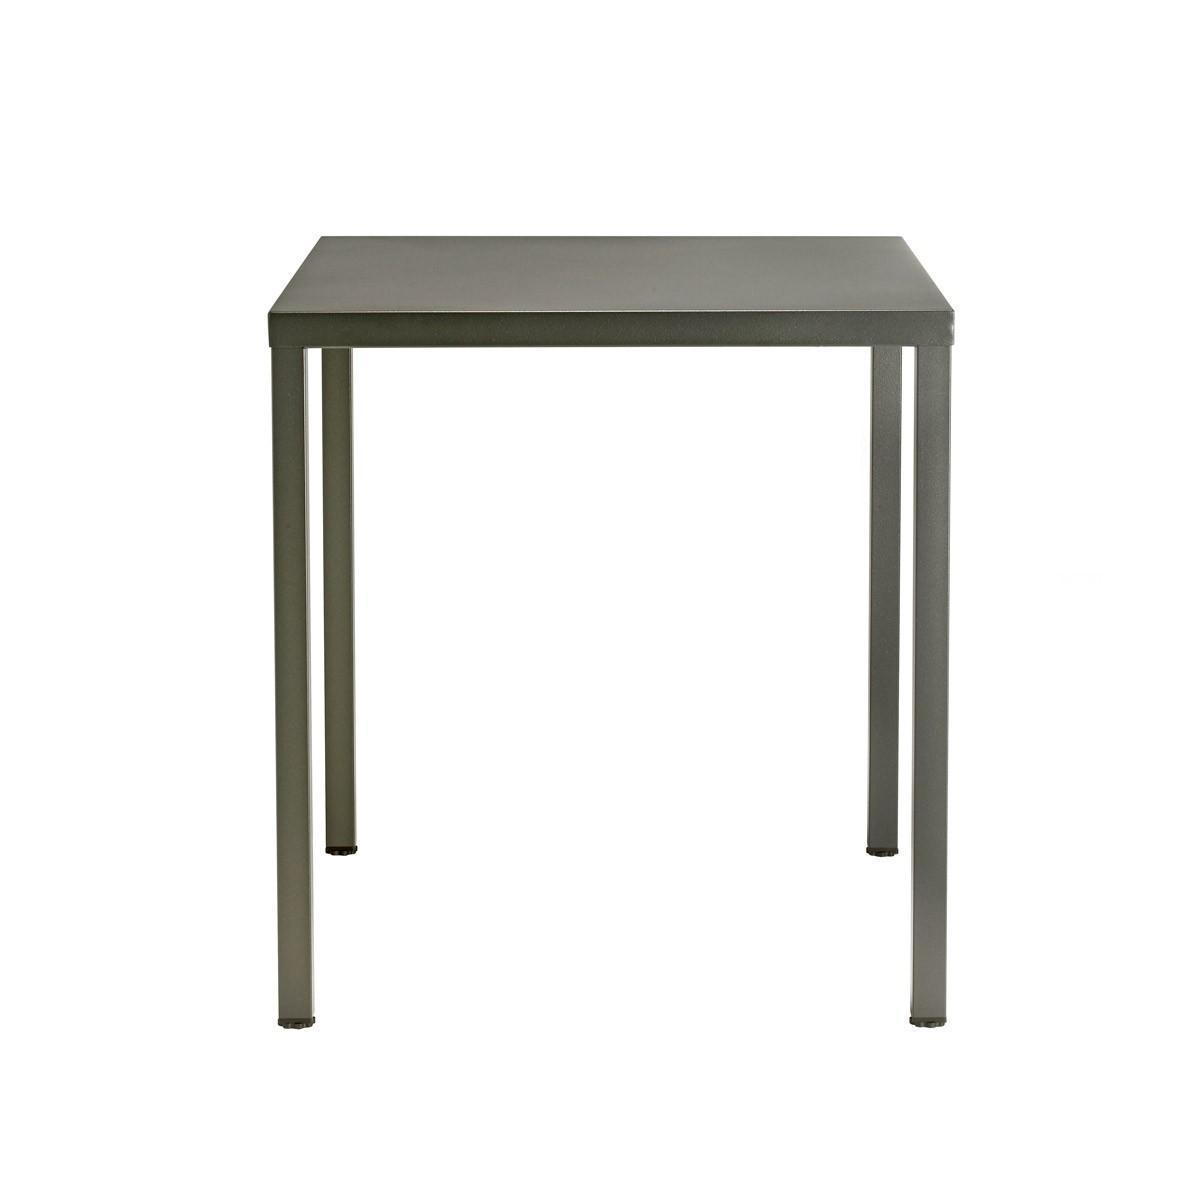 Стол обеденный металлический Summer table